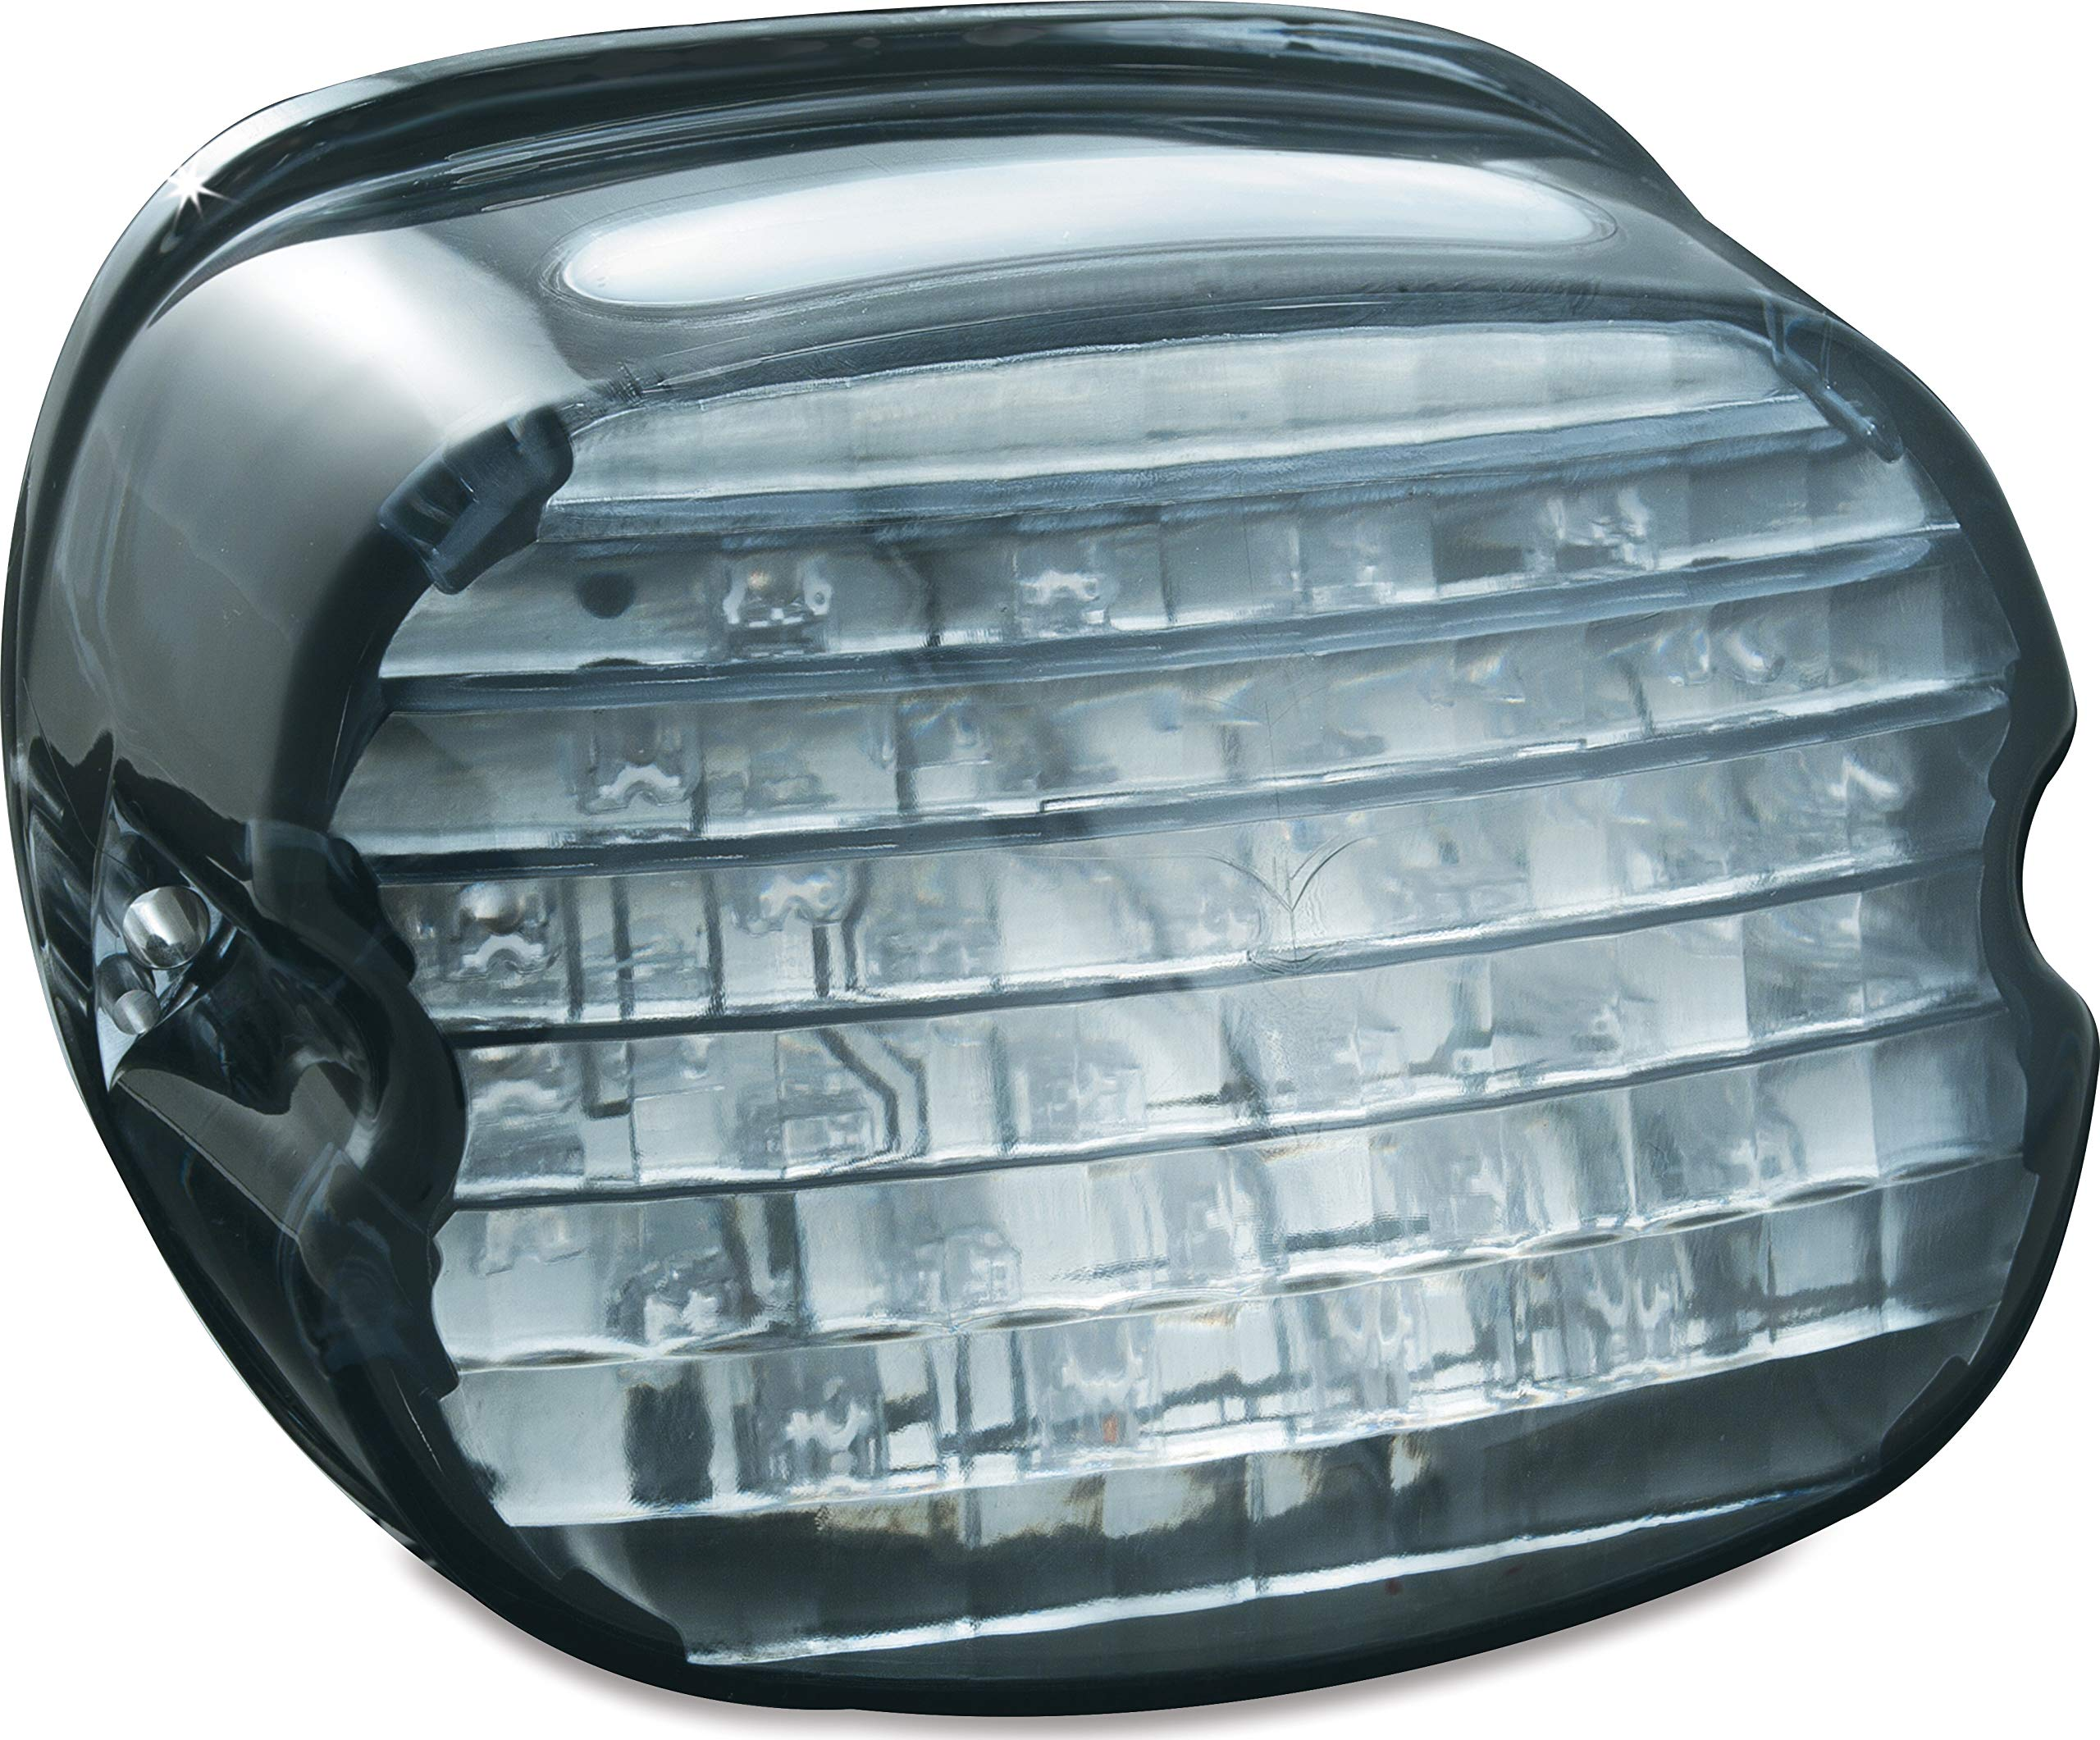 Kuryakyn 5438 Motorcycle Lighting: Low Profile LED Taillight Conversion Kit with License Plate Illumination Light for 1988-2019 Harley-Davidson Motorcycles, Smoke Lens by Kuryakyn